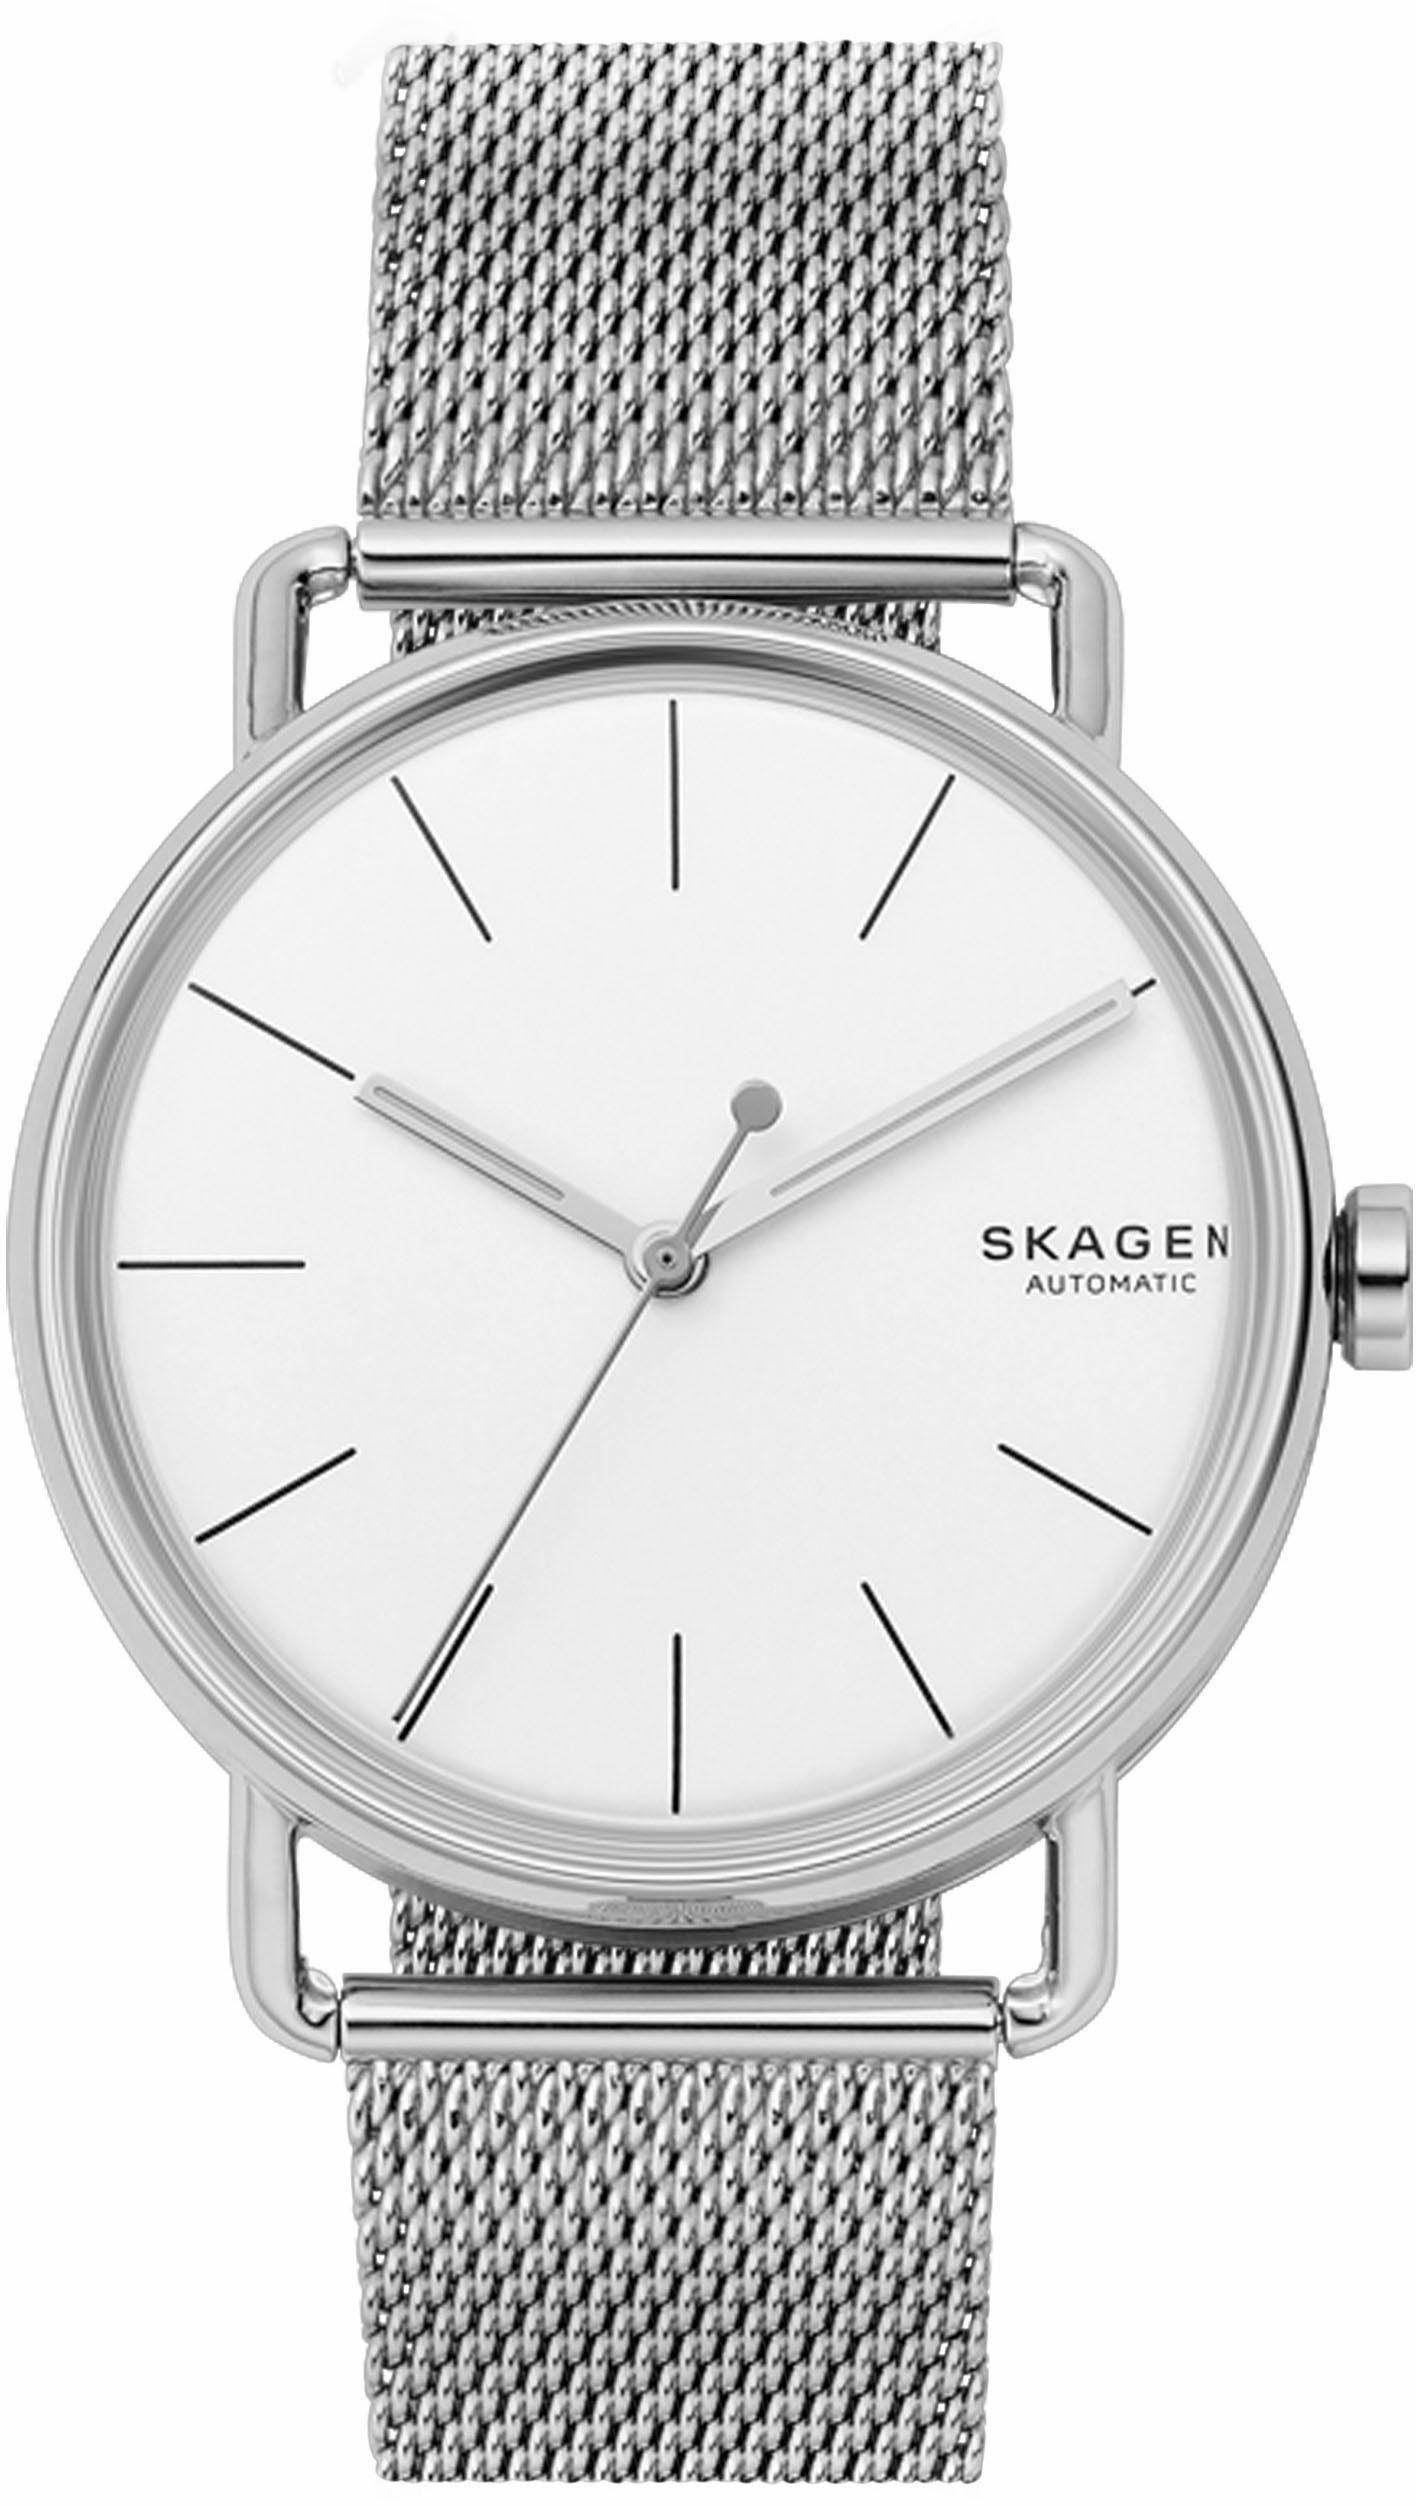 Skagen Automatikuhr »FALSTER, SKW6399«